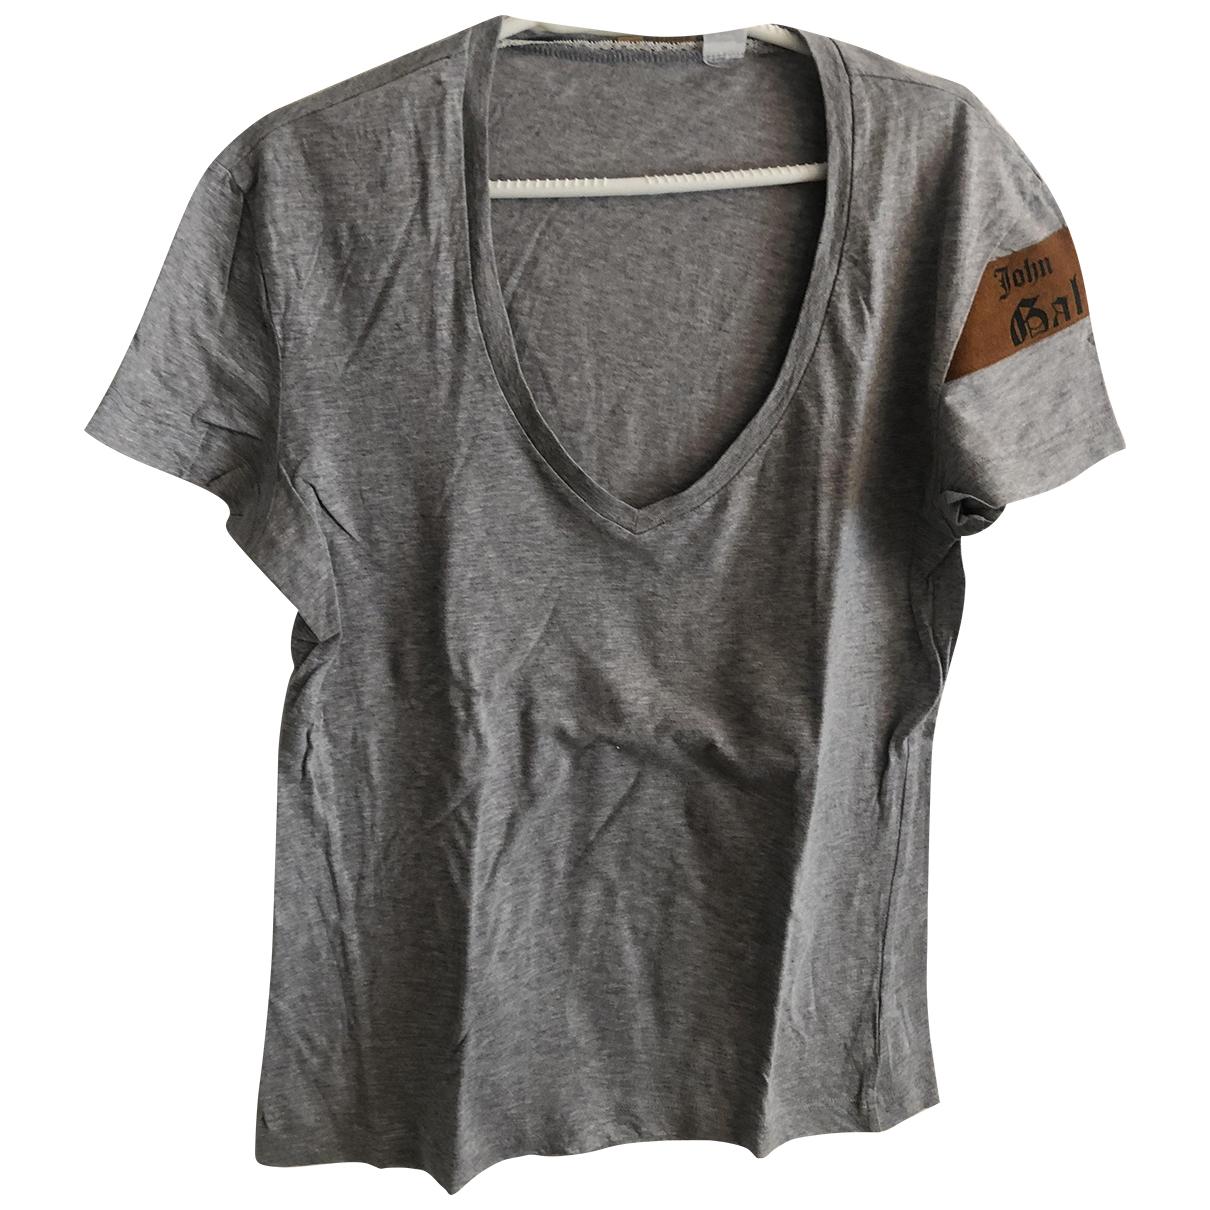 John Galliano - Tee shirts   pour homme en coton - gris